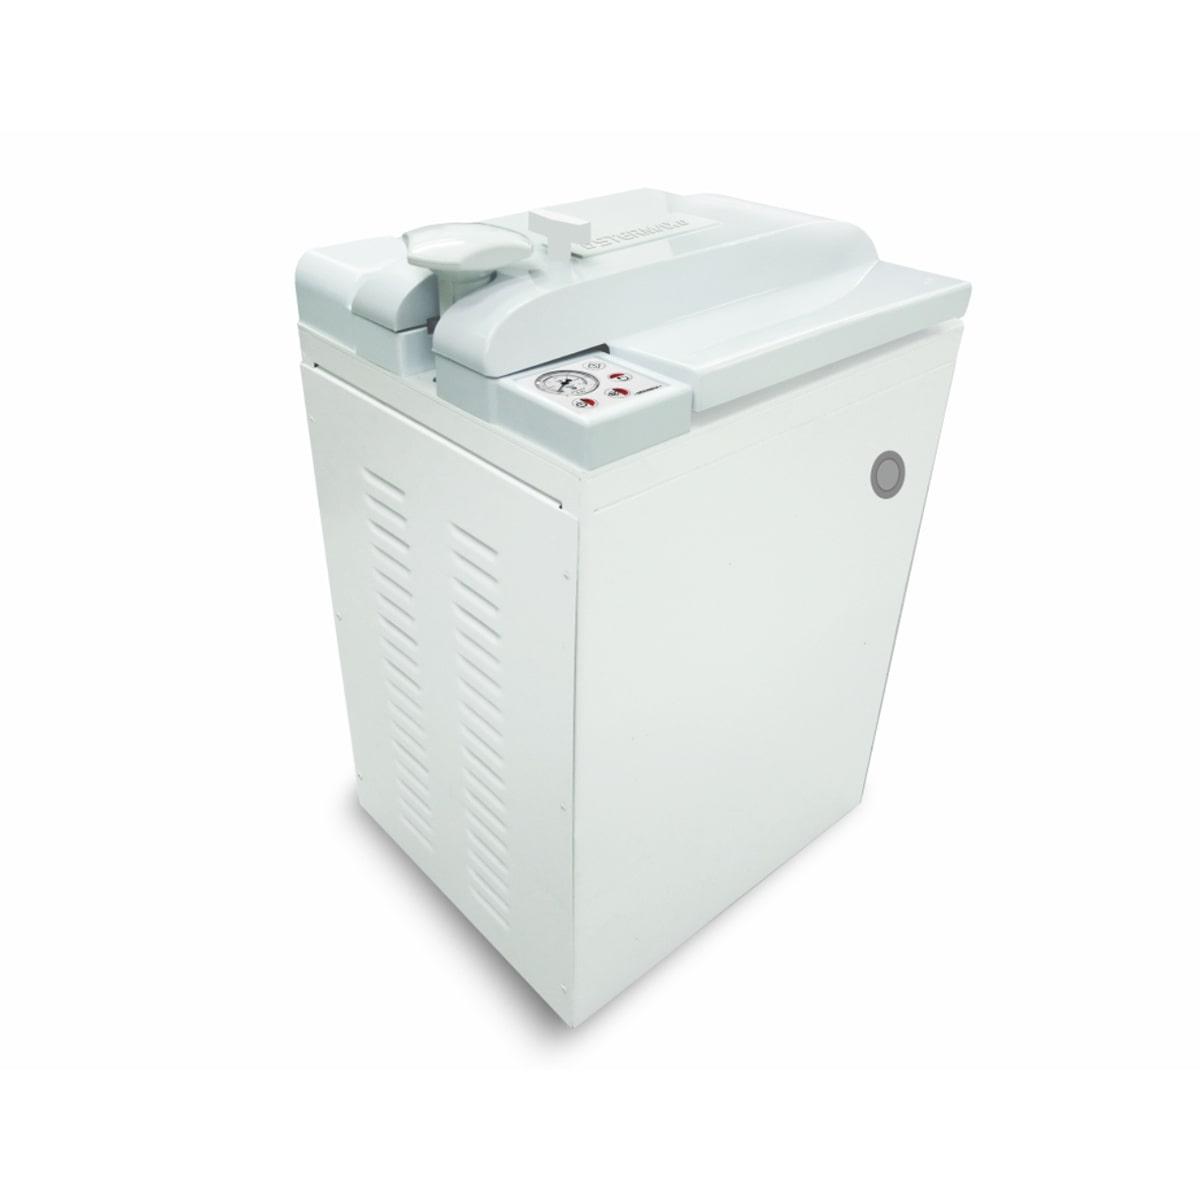 Autoclave Vertical Analógica Gravitacional Normal Box 75 litros  Stermax